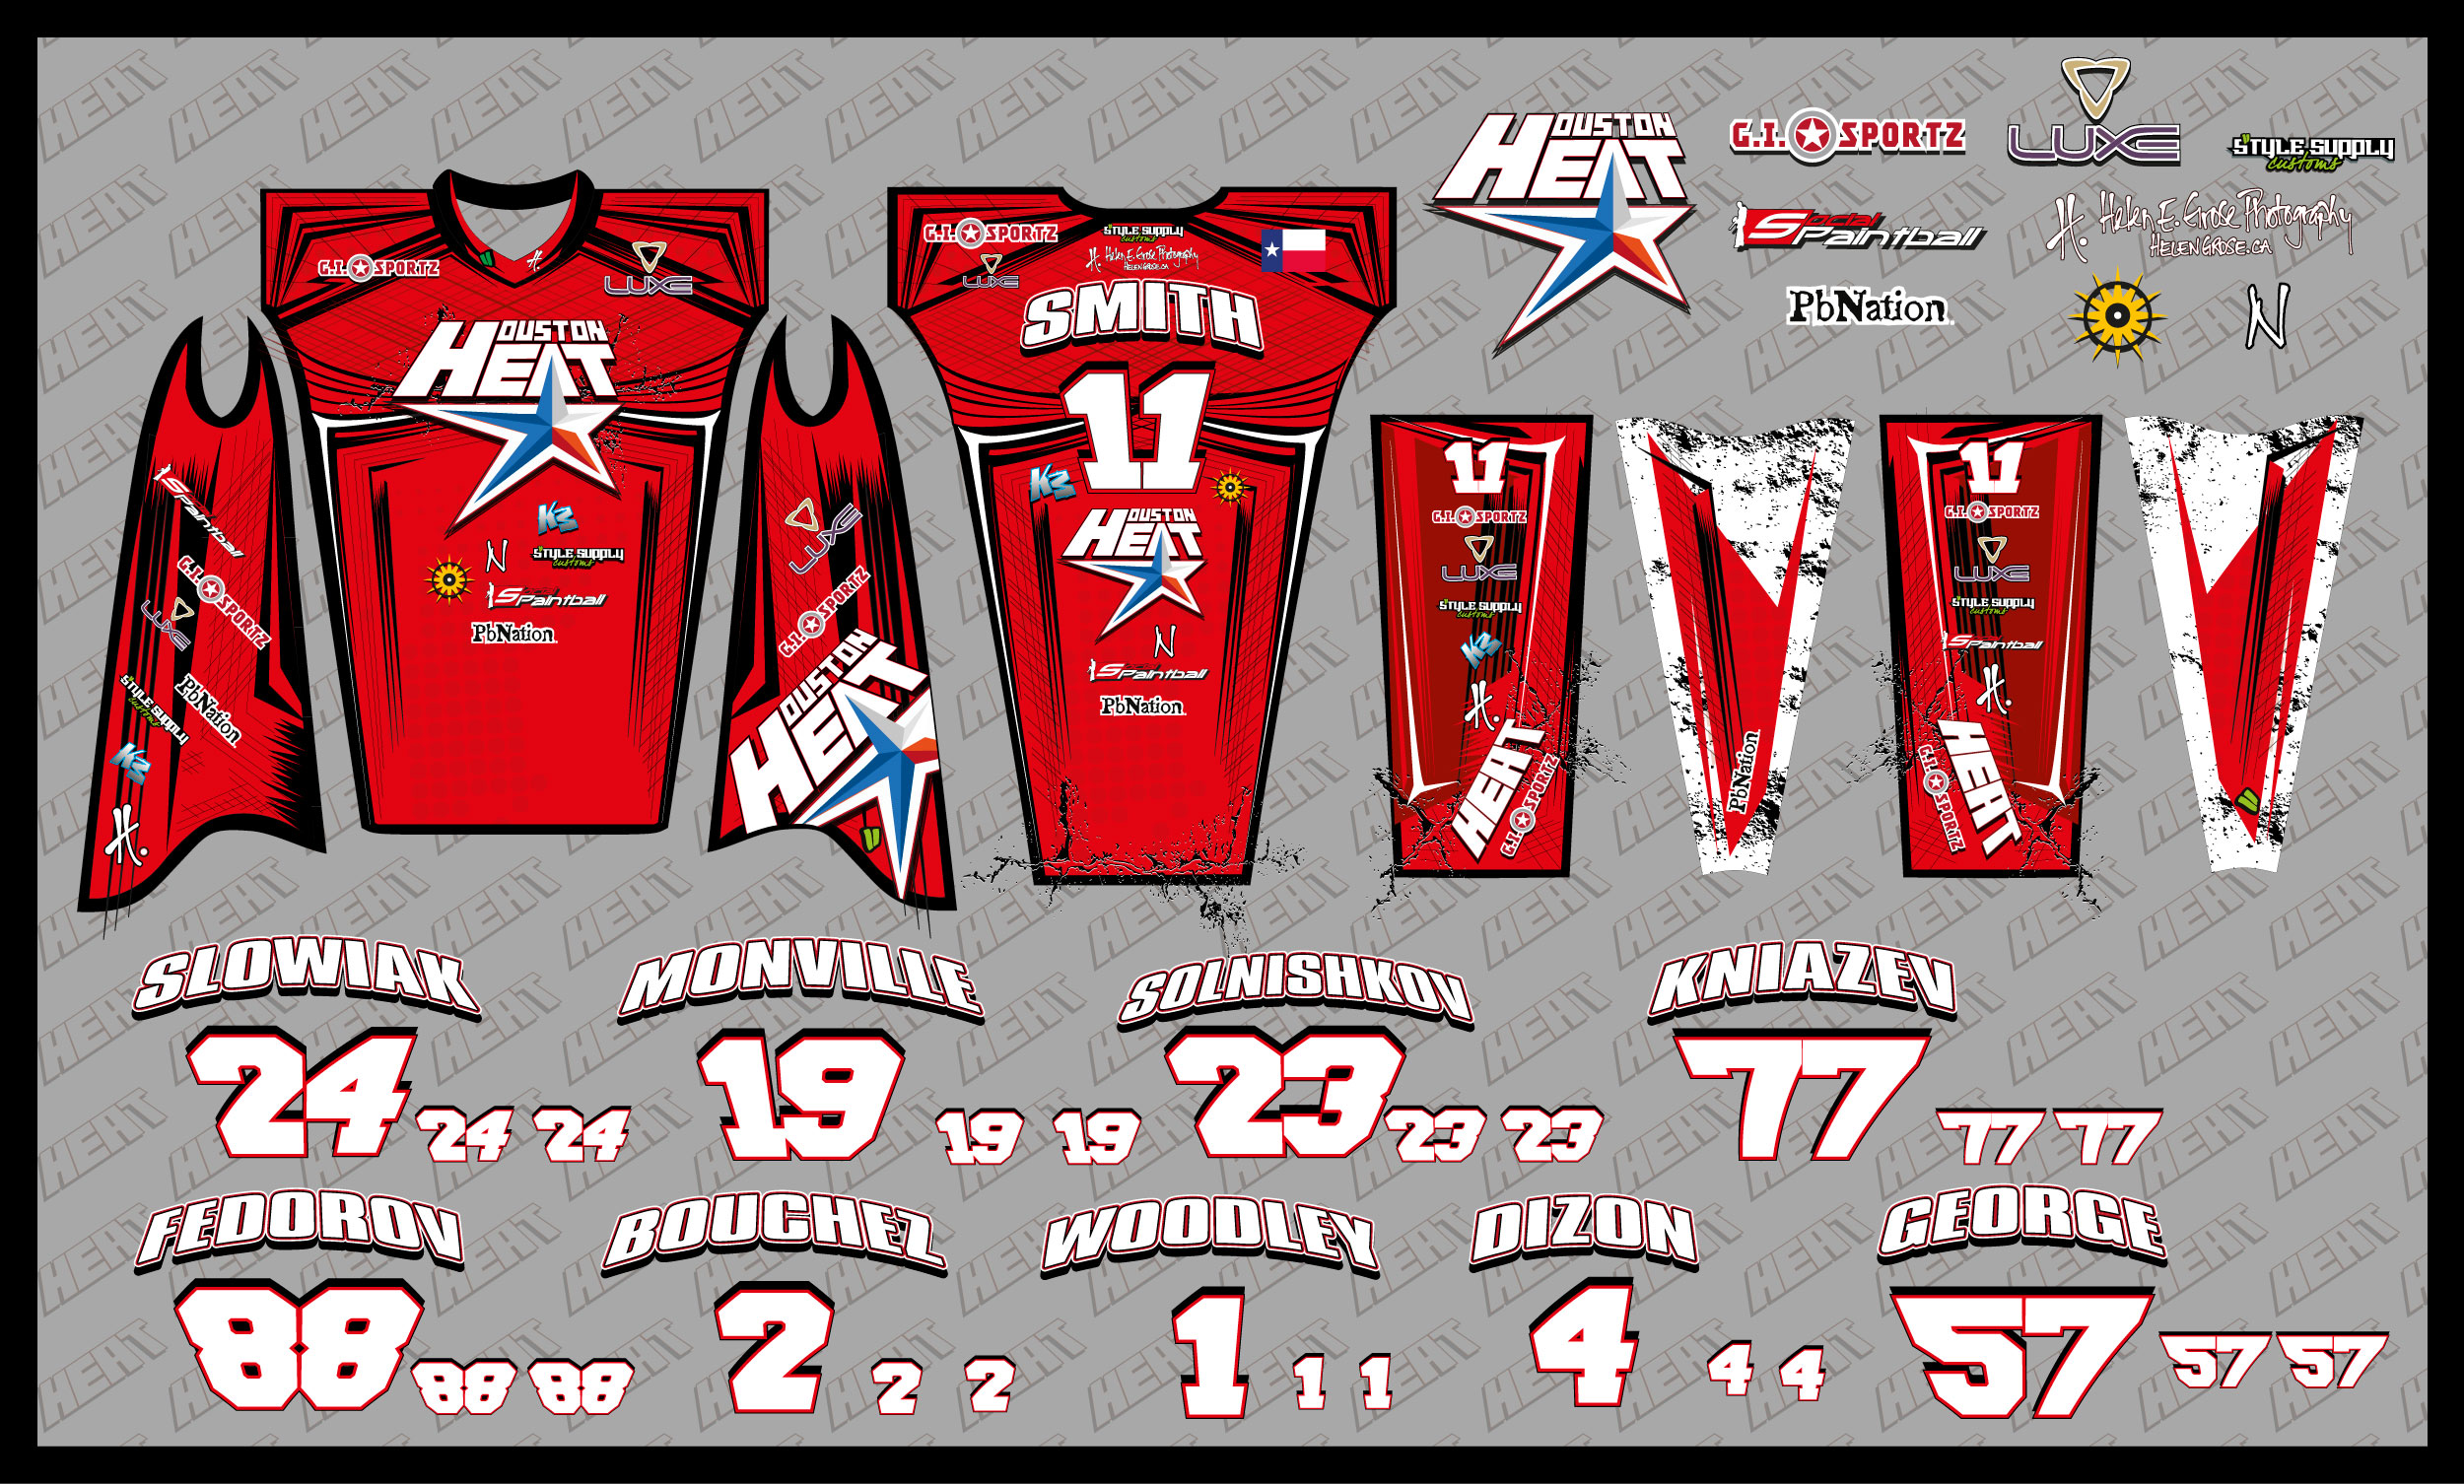 7782011b7 2012 Houston Heat Paintball Jersey - Texas Edition - Social Paintball